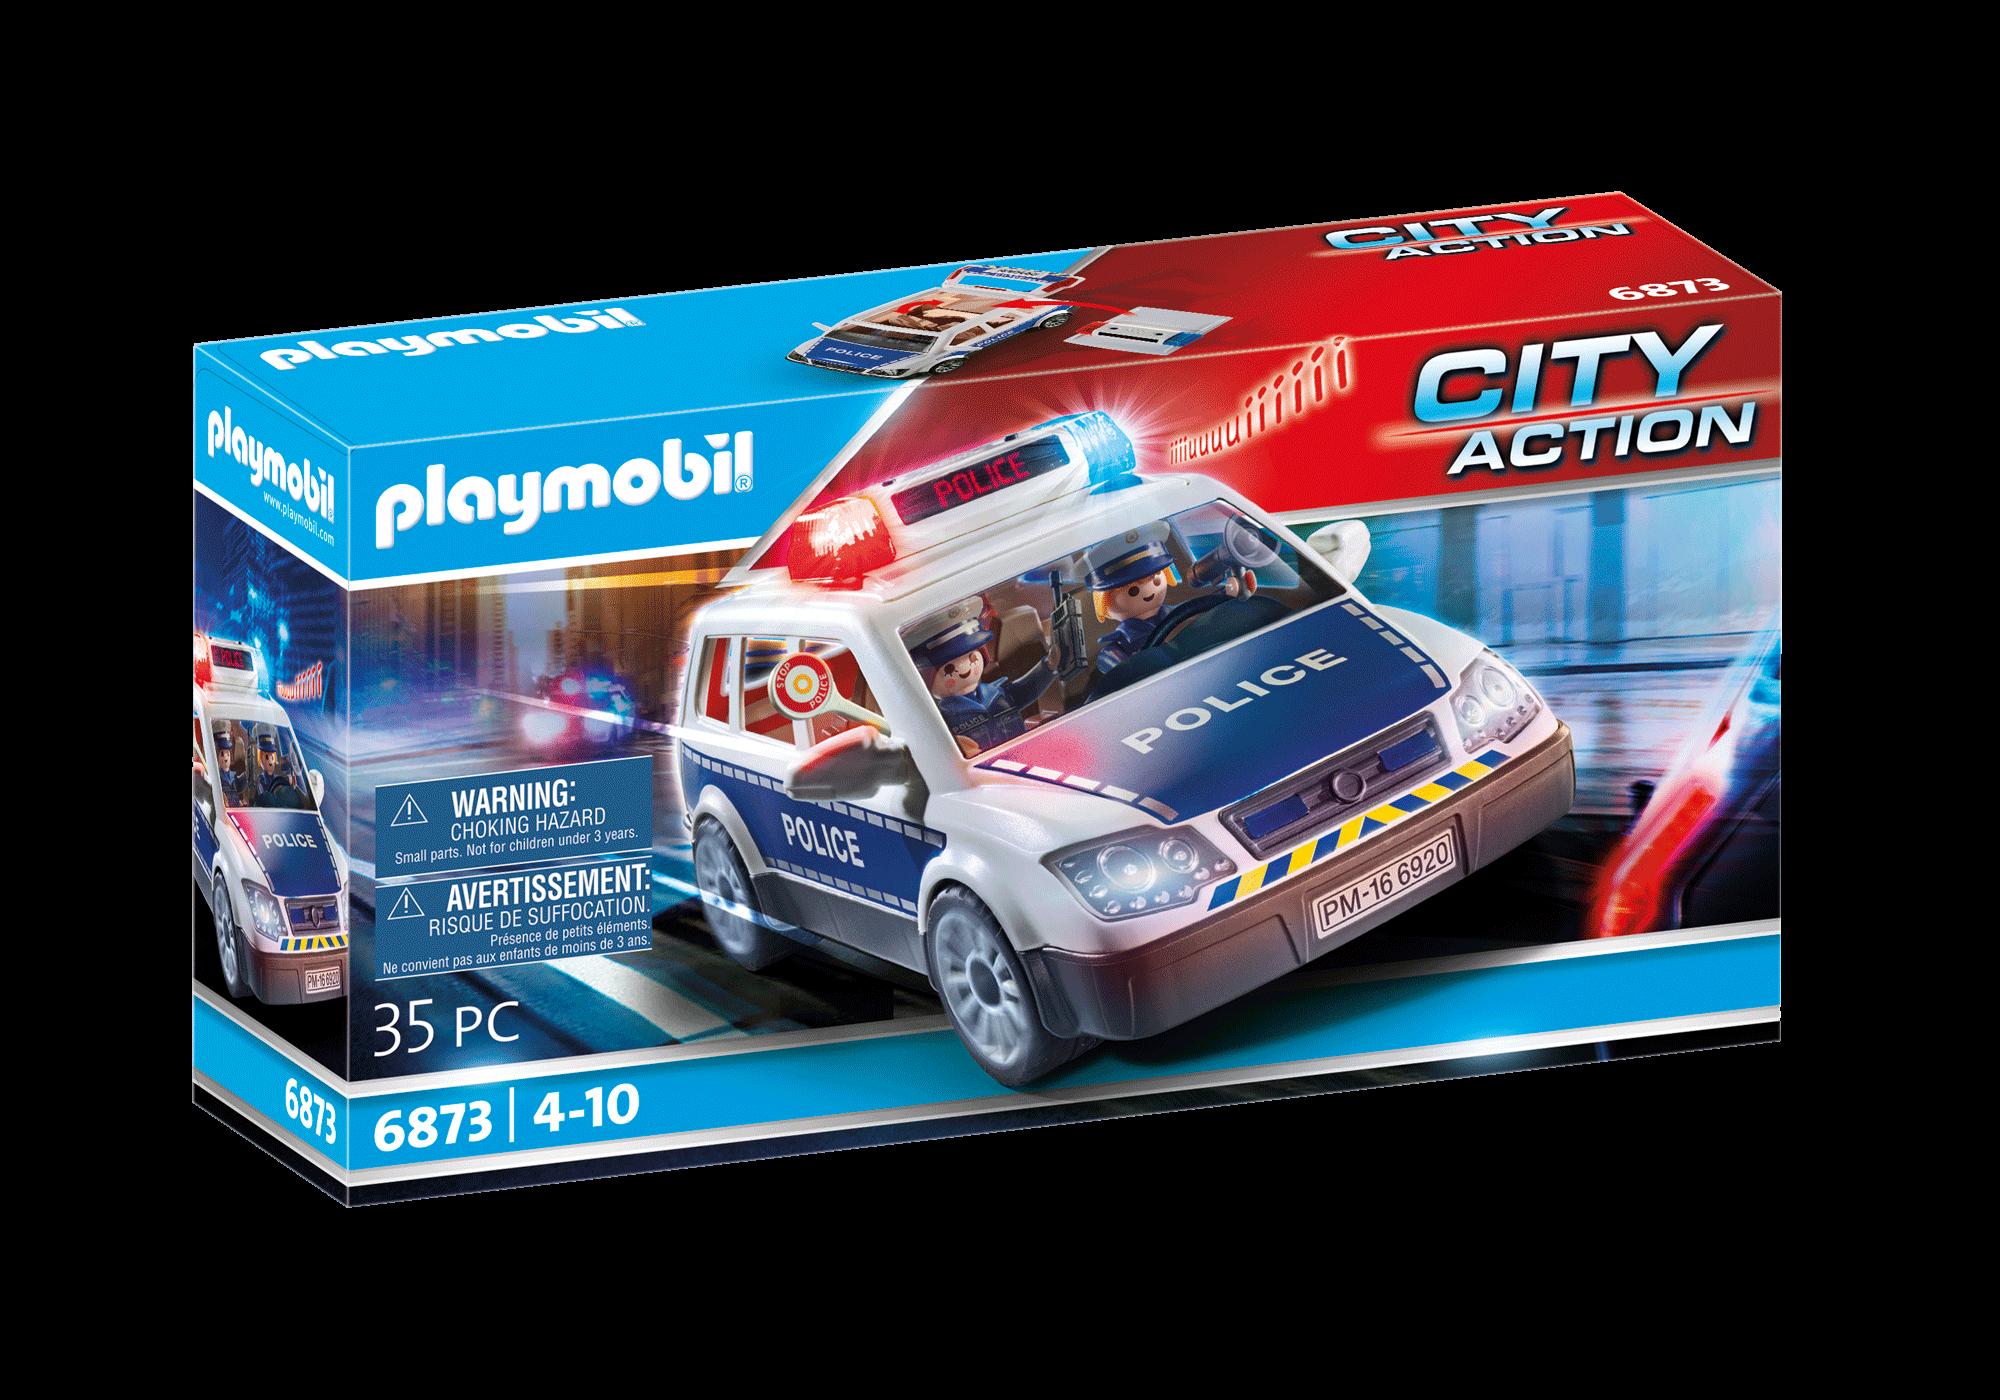 http://media.playmobil.com/i/playmobil/6873_product_box_front/Polizei-Einsatzwagen